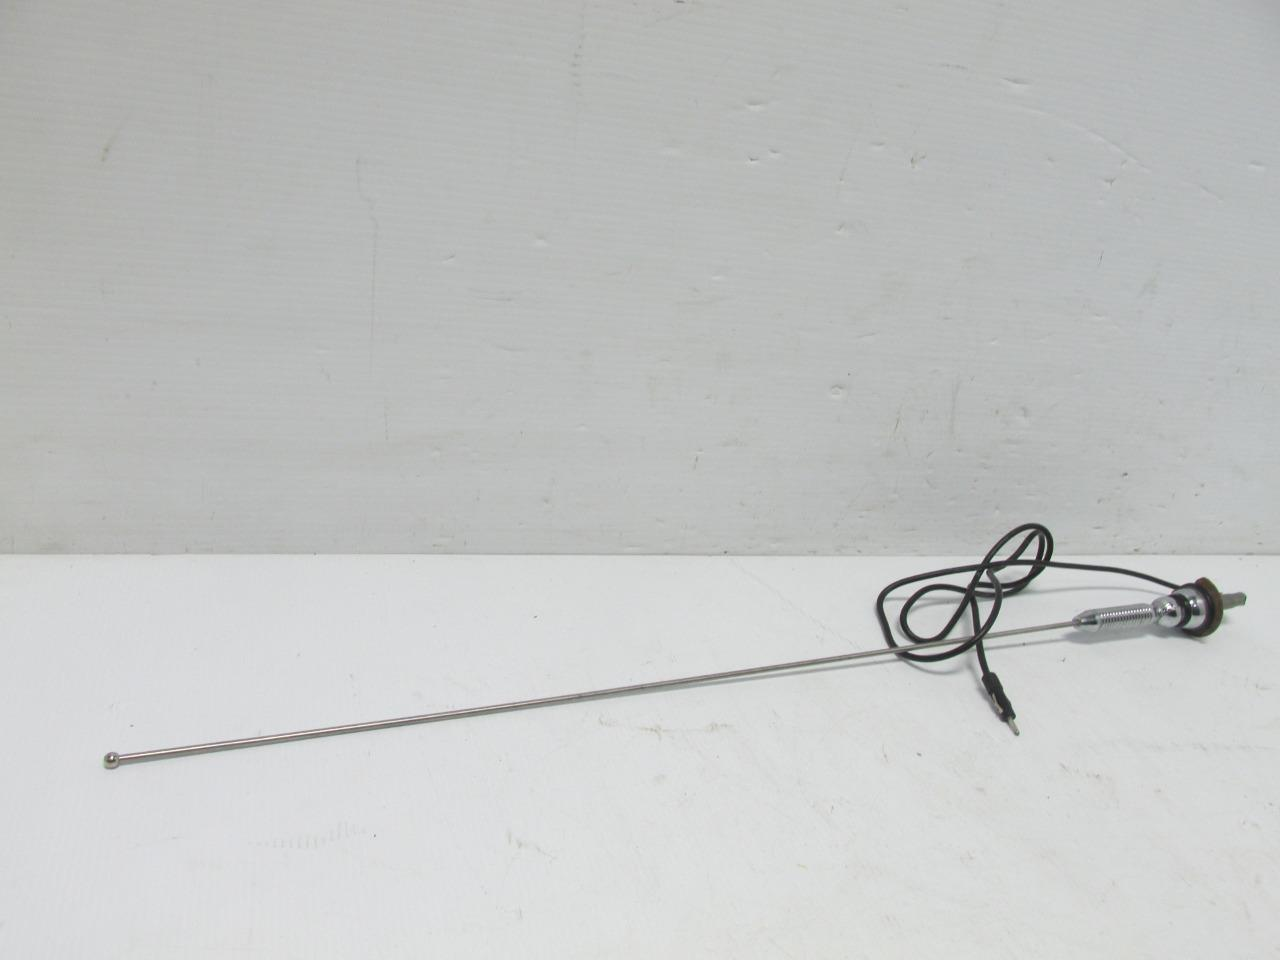 cfmoto cf moto snyper 600 utv 2014 radio antenna assembly cfmoto cf moto snyper 600 utv 2014 radio antenna assembly